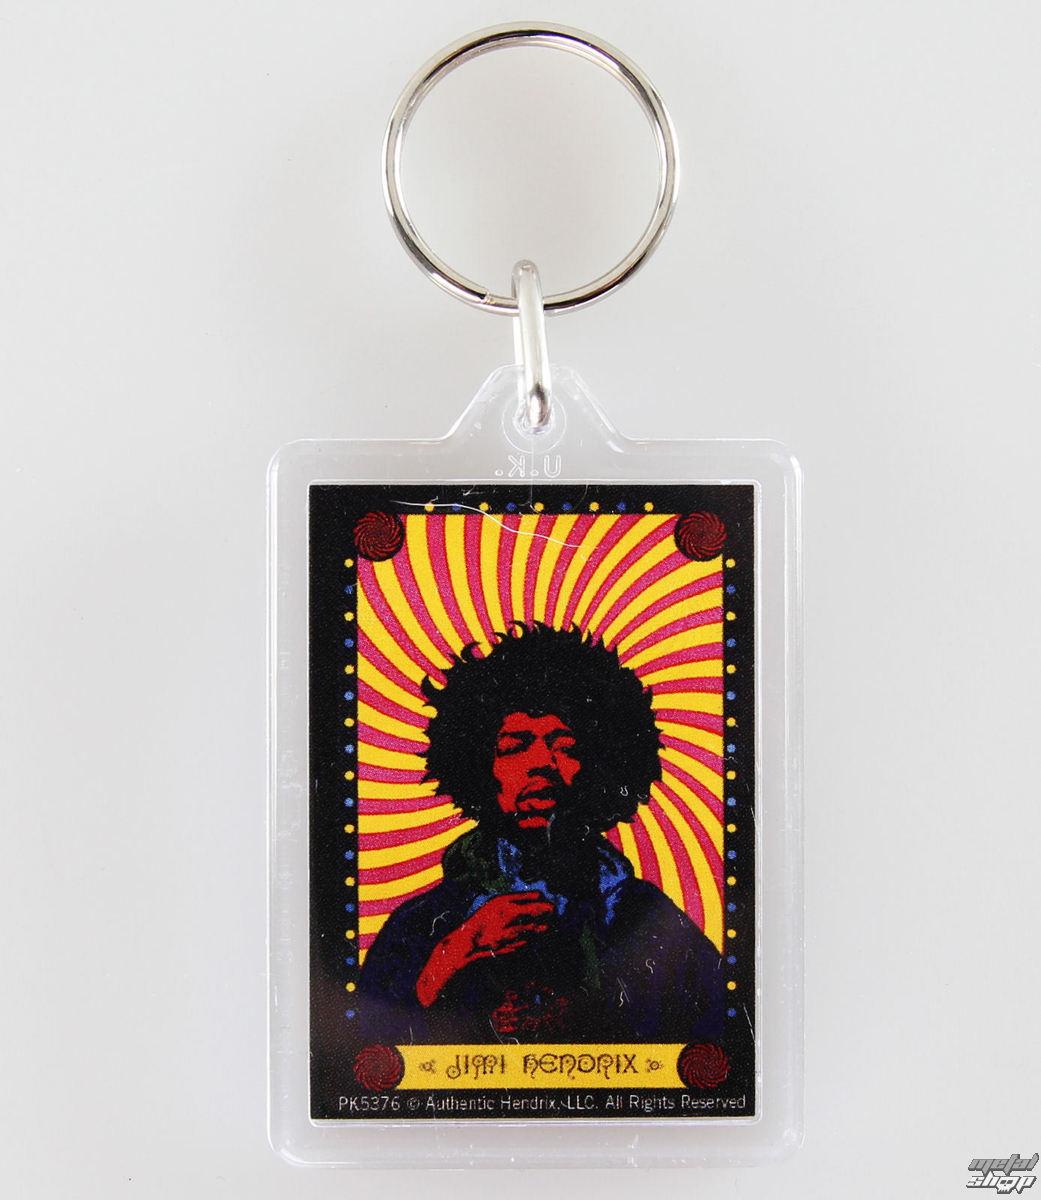 kľúčenka (prívesok) Jimi Hendrix - Pyschedelic - PYRAMID POSTERS - PK5376